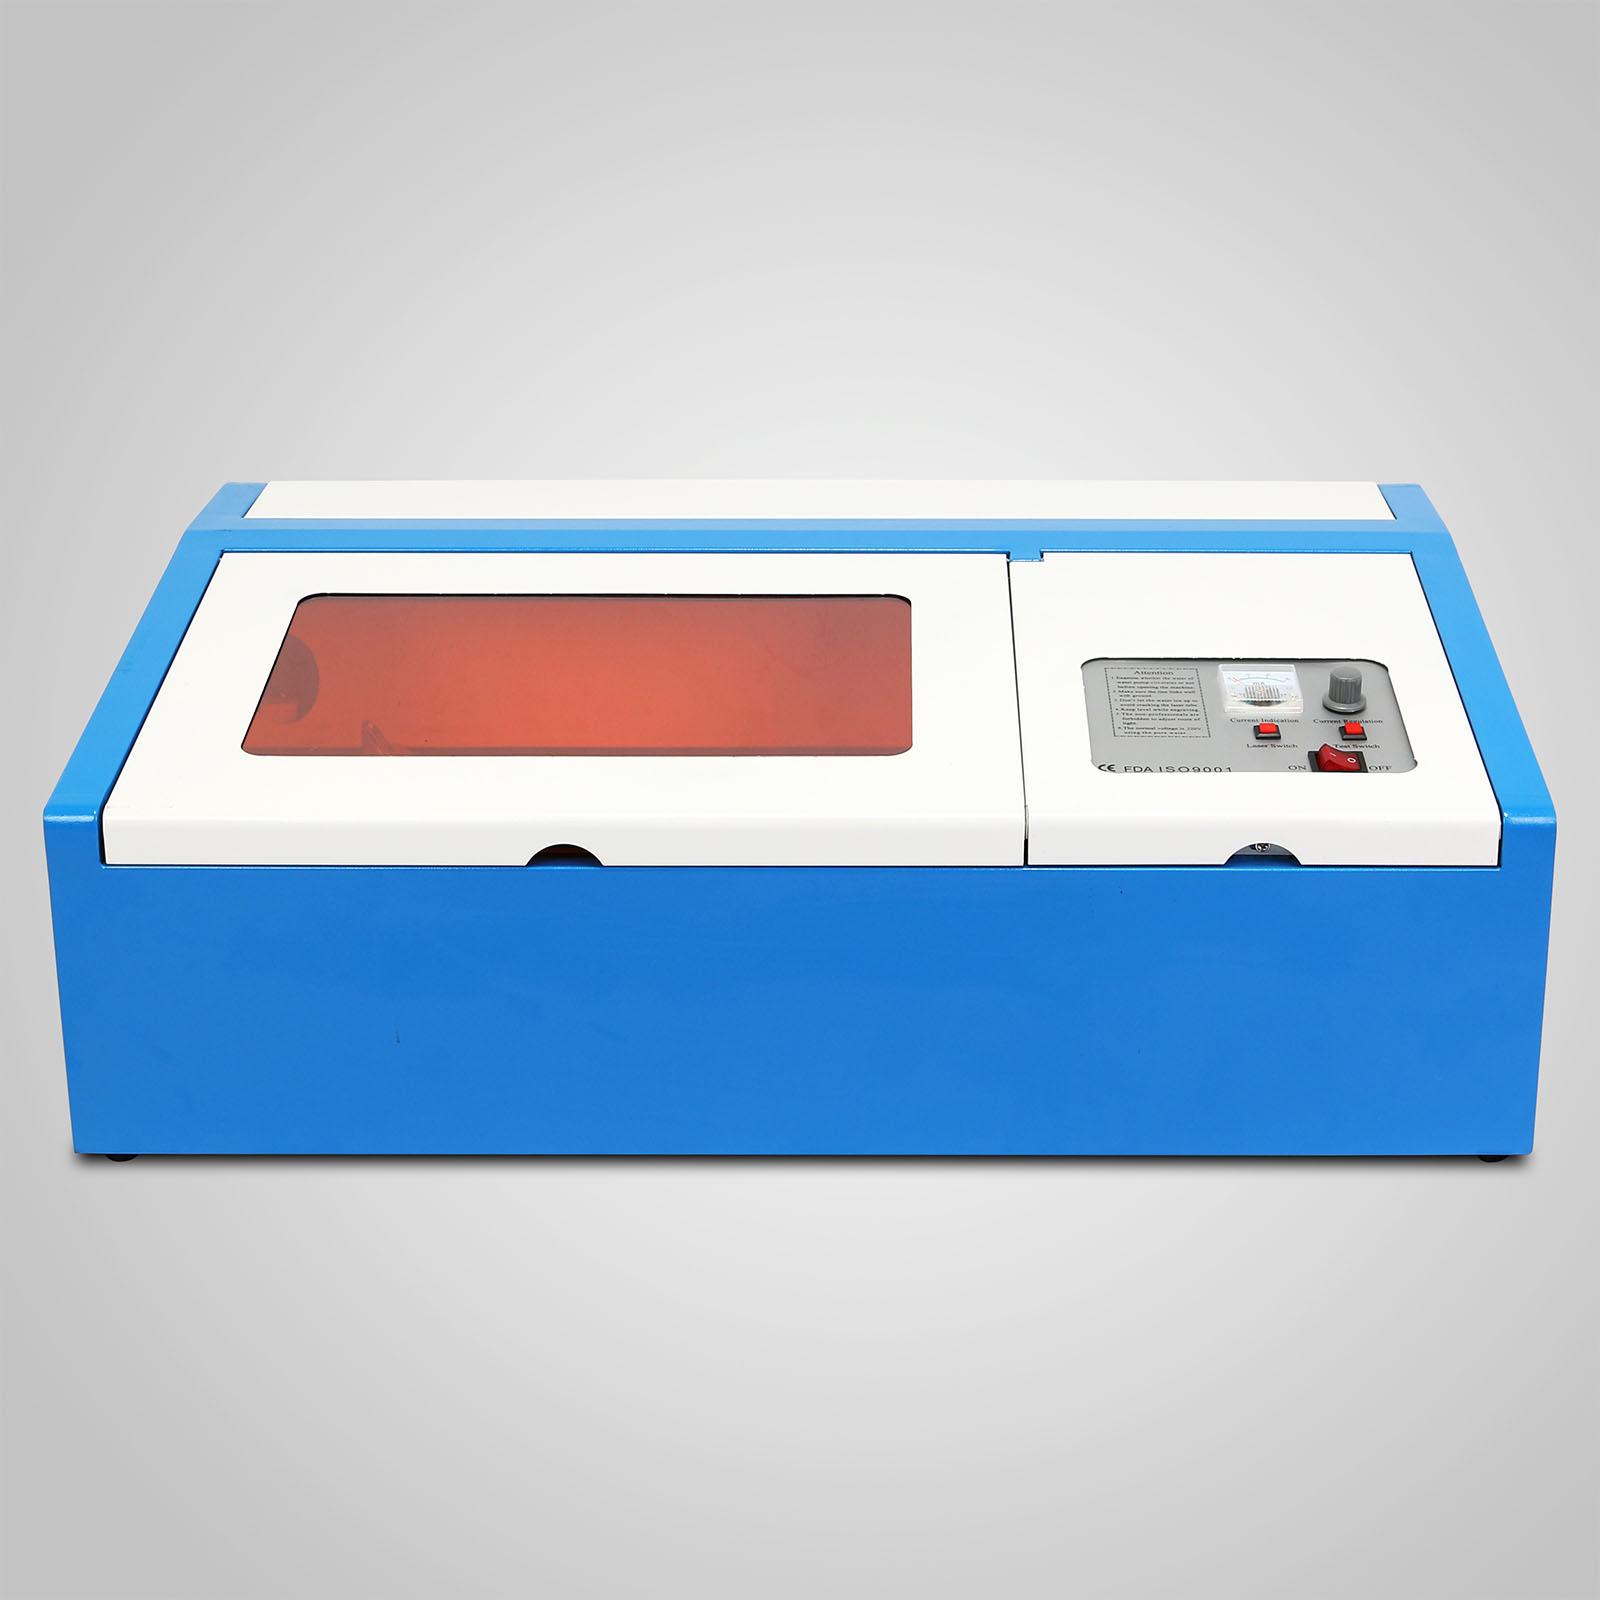 Macchina-per-Incisione-Laser-CO2-40-130W-Asse-Rotante-Tagliatrice-Incisore miniatura 16